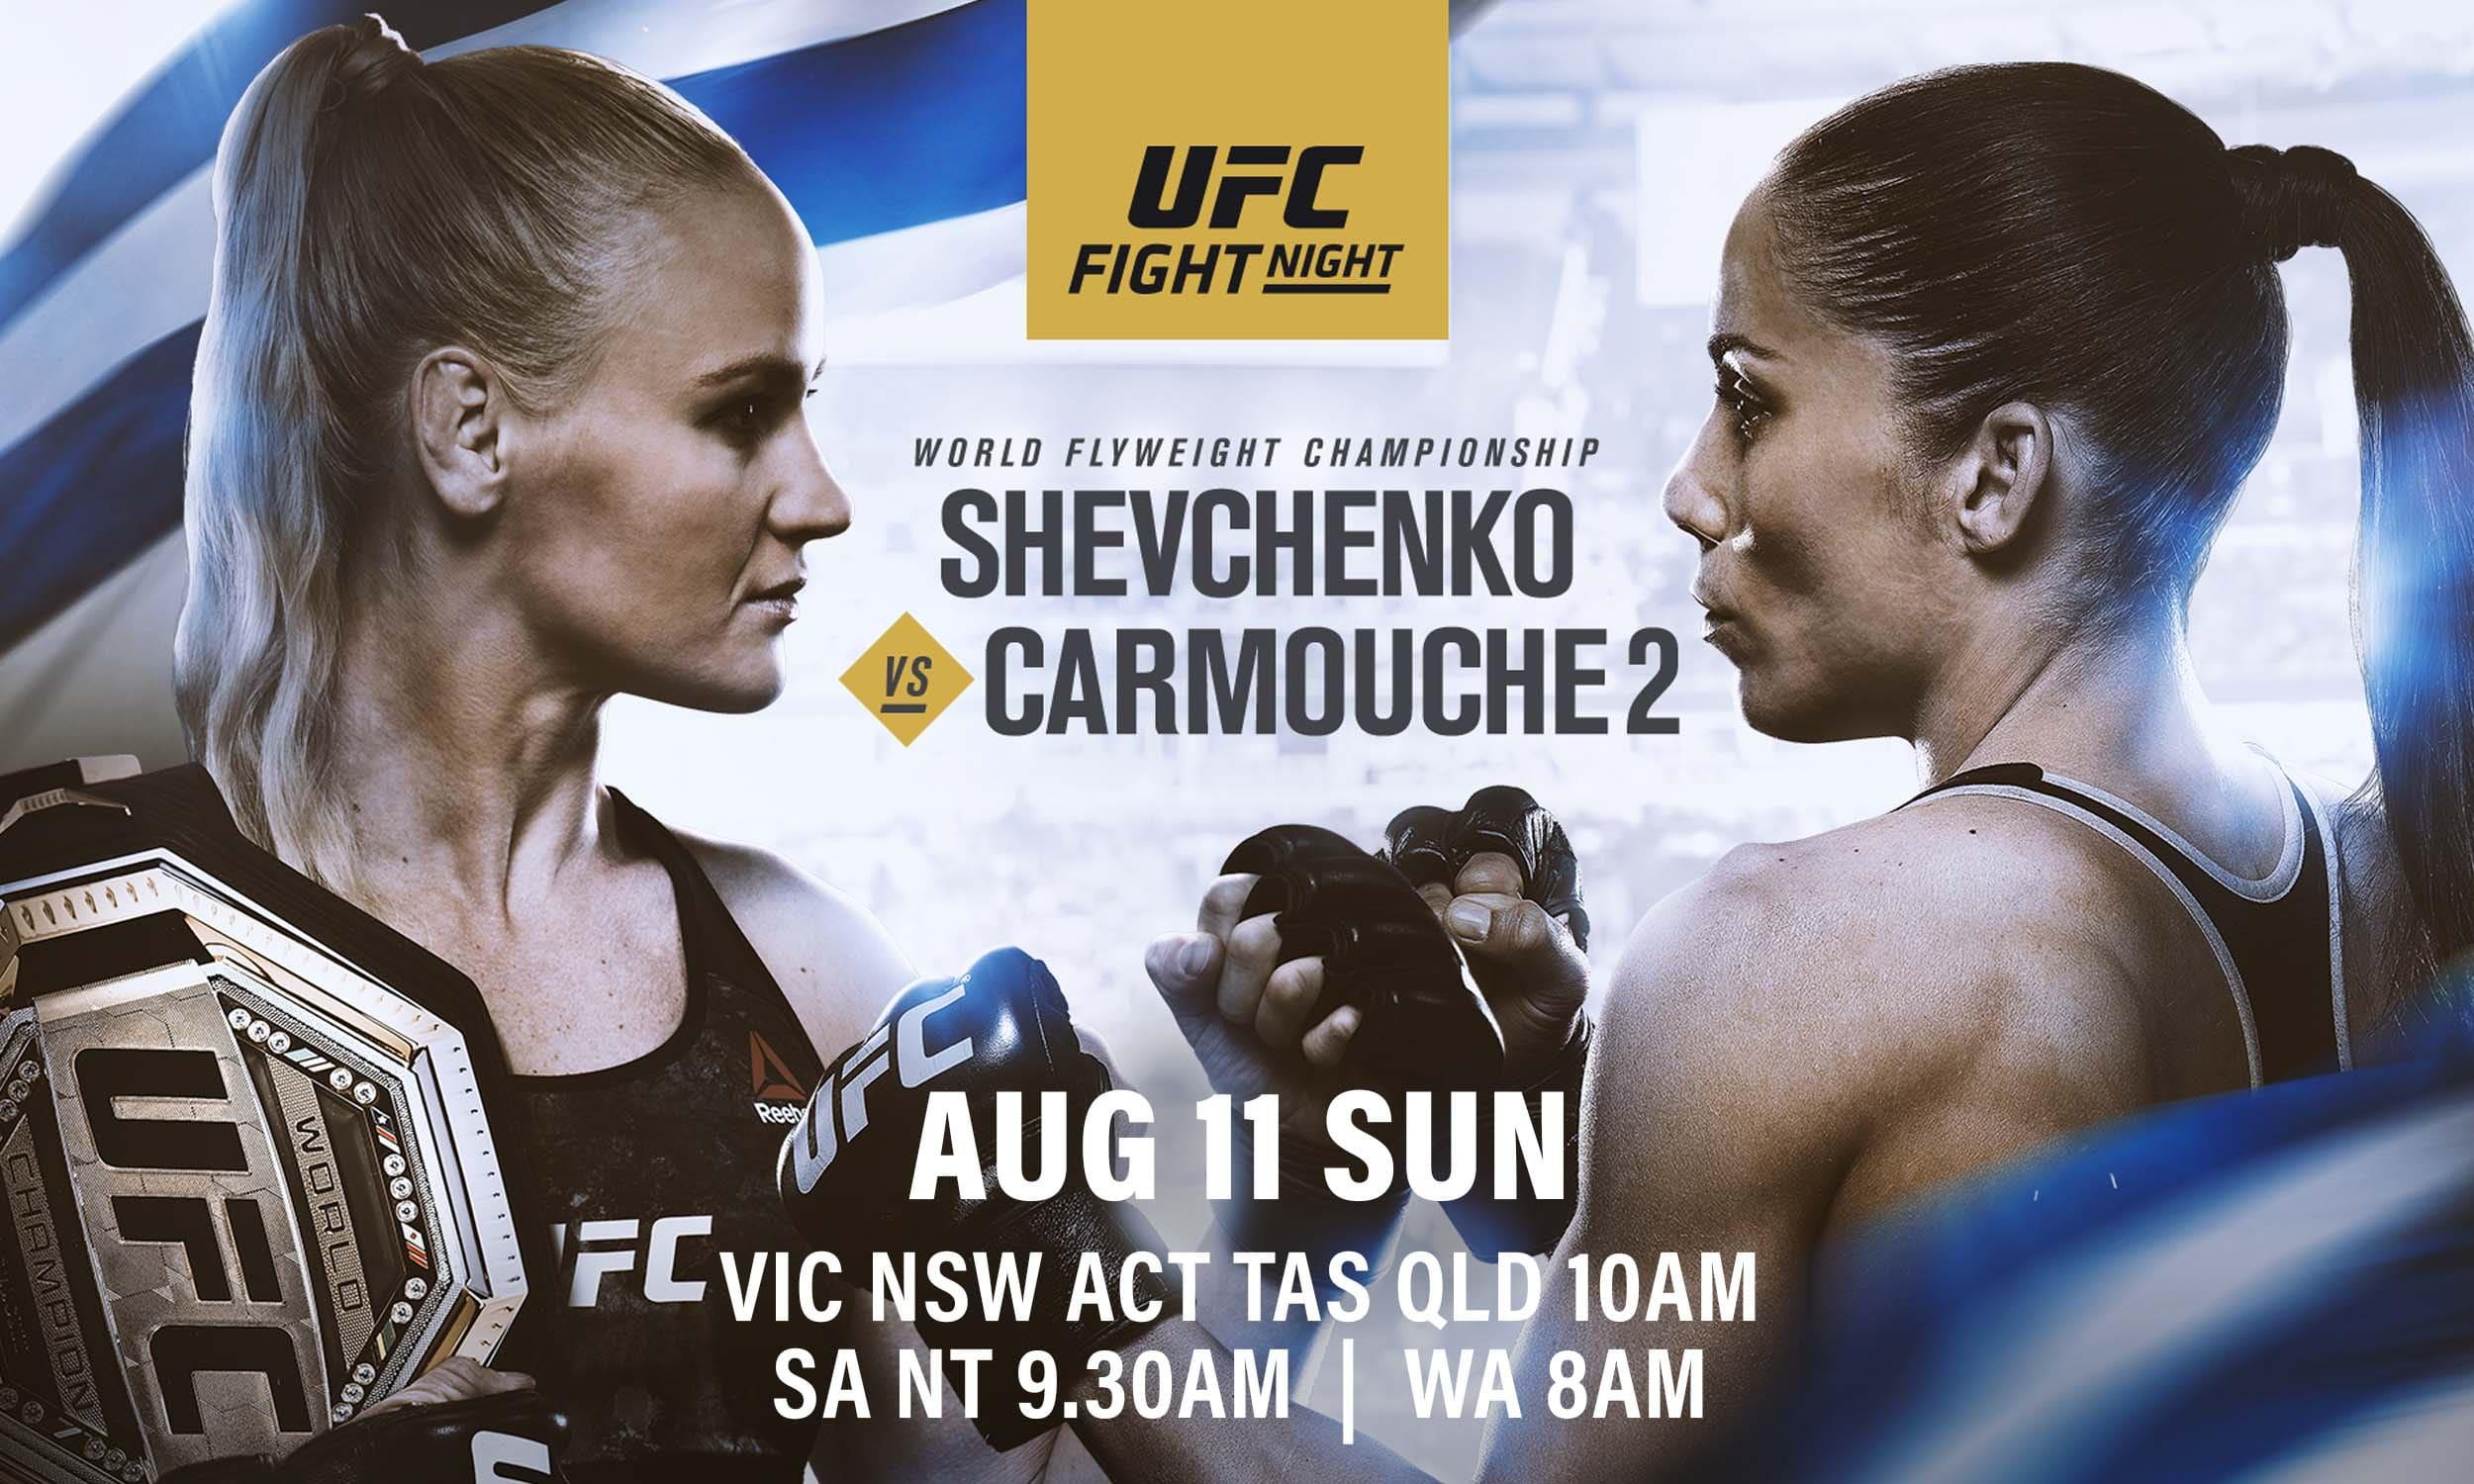 UFC Fight Night_Shevchenko vs Carmouche_Aug 11_BATP-min.jpg